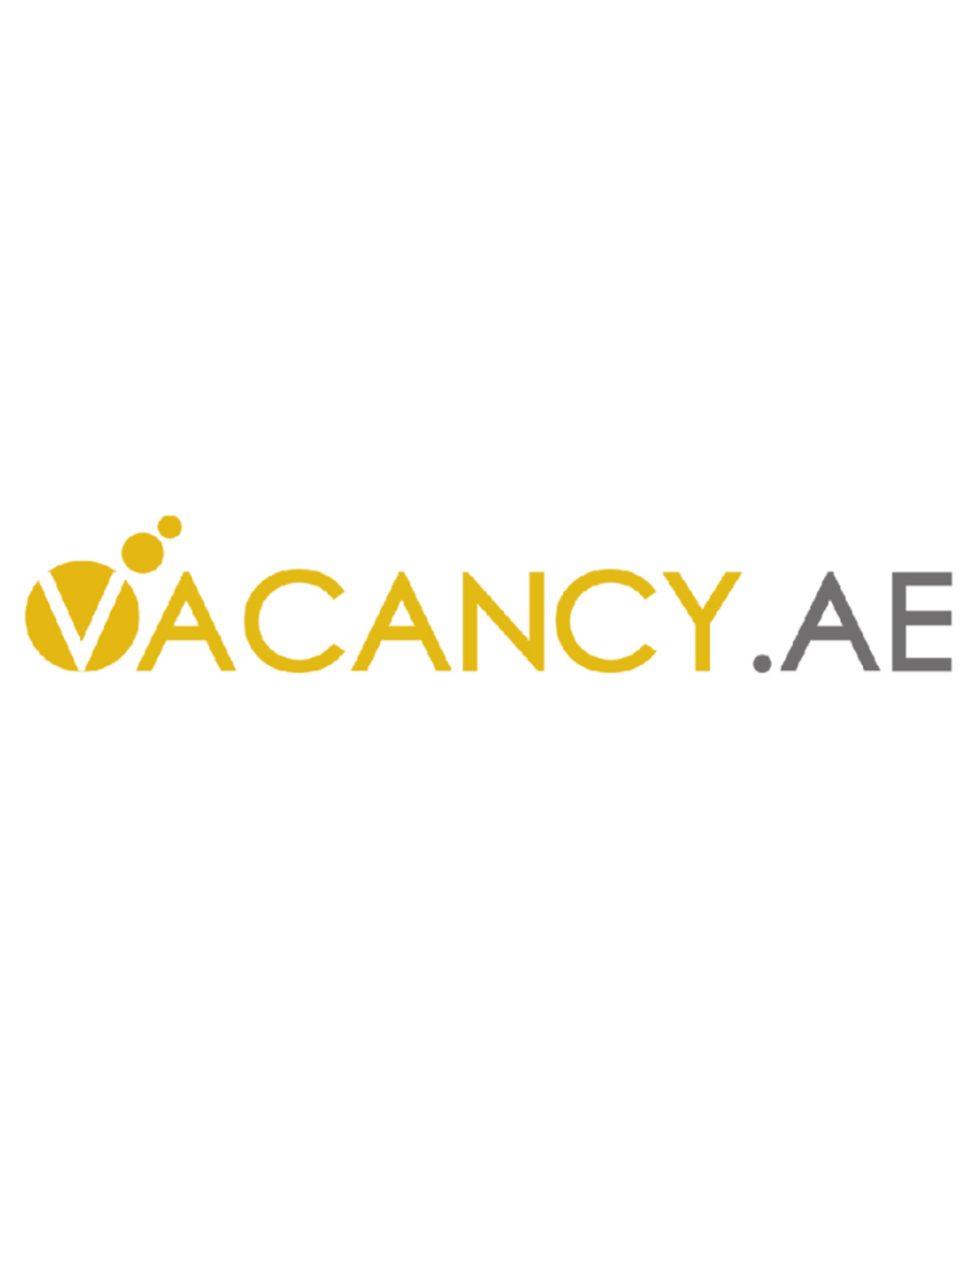 Vacancy.ae – Brand